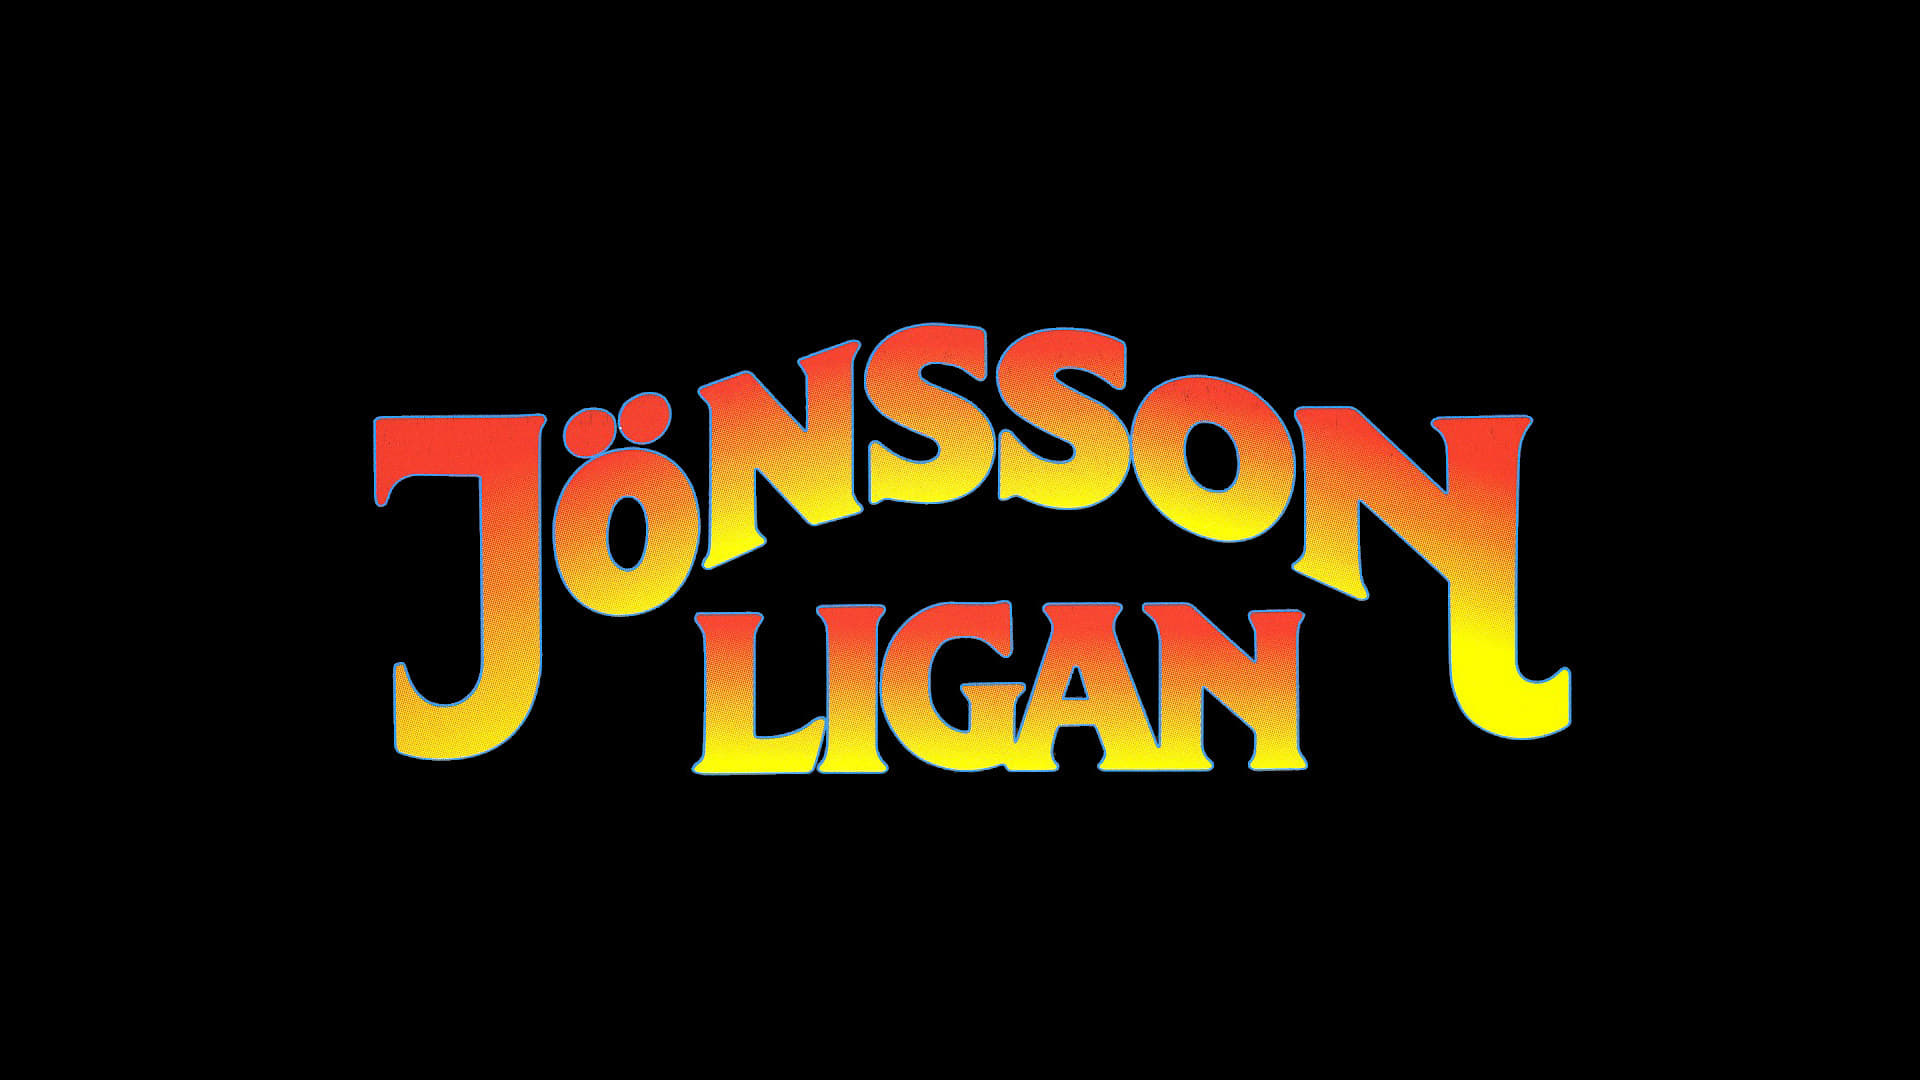 jönssonligan download